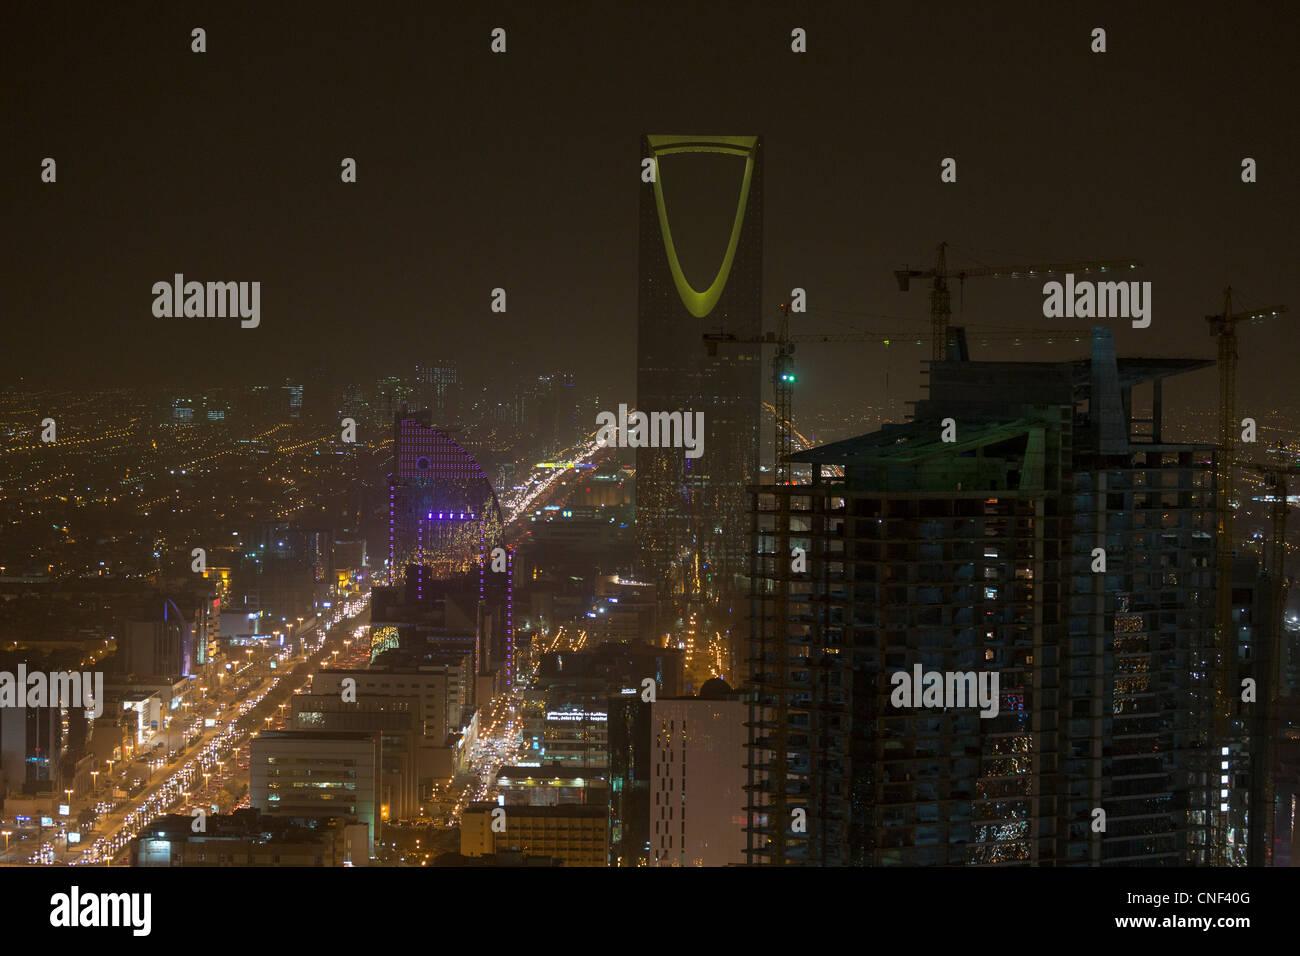 Vista de Riyadh, Arabia Saudita Imagen De Stock